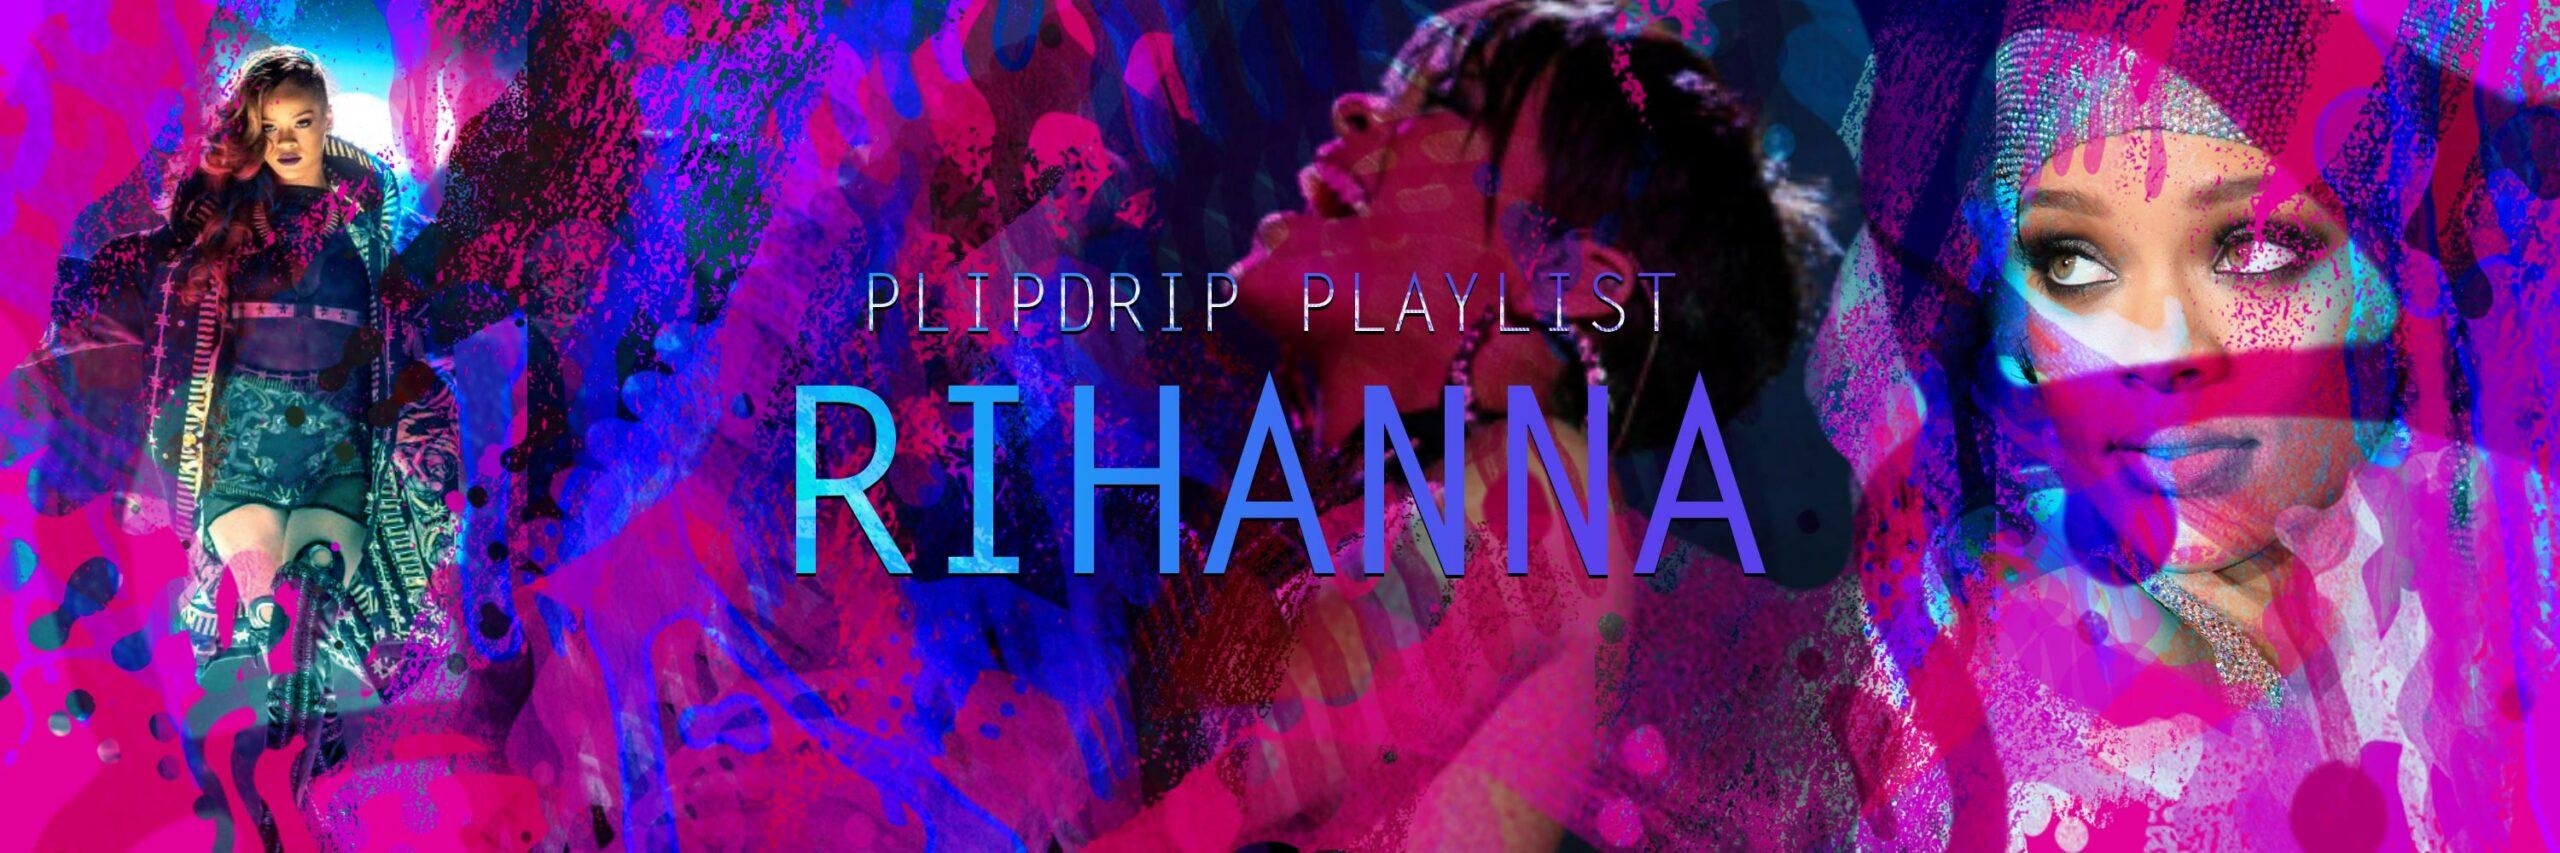 PF-rihanna-banner-1